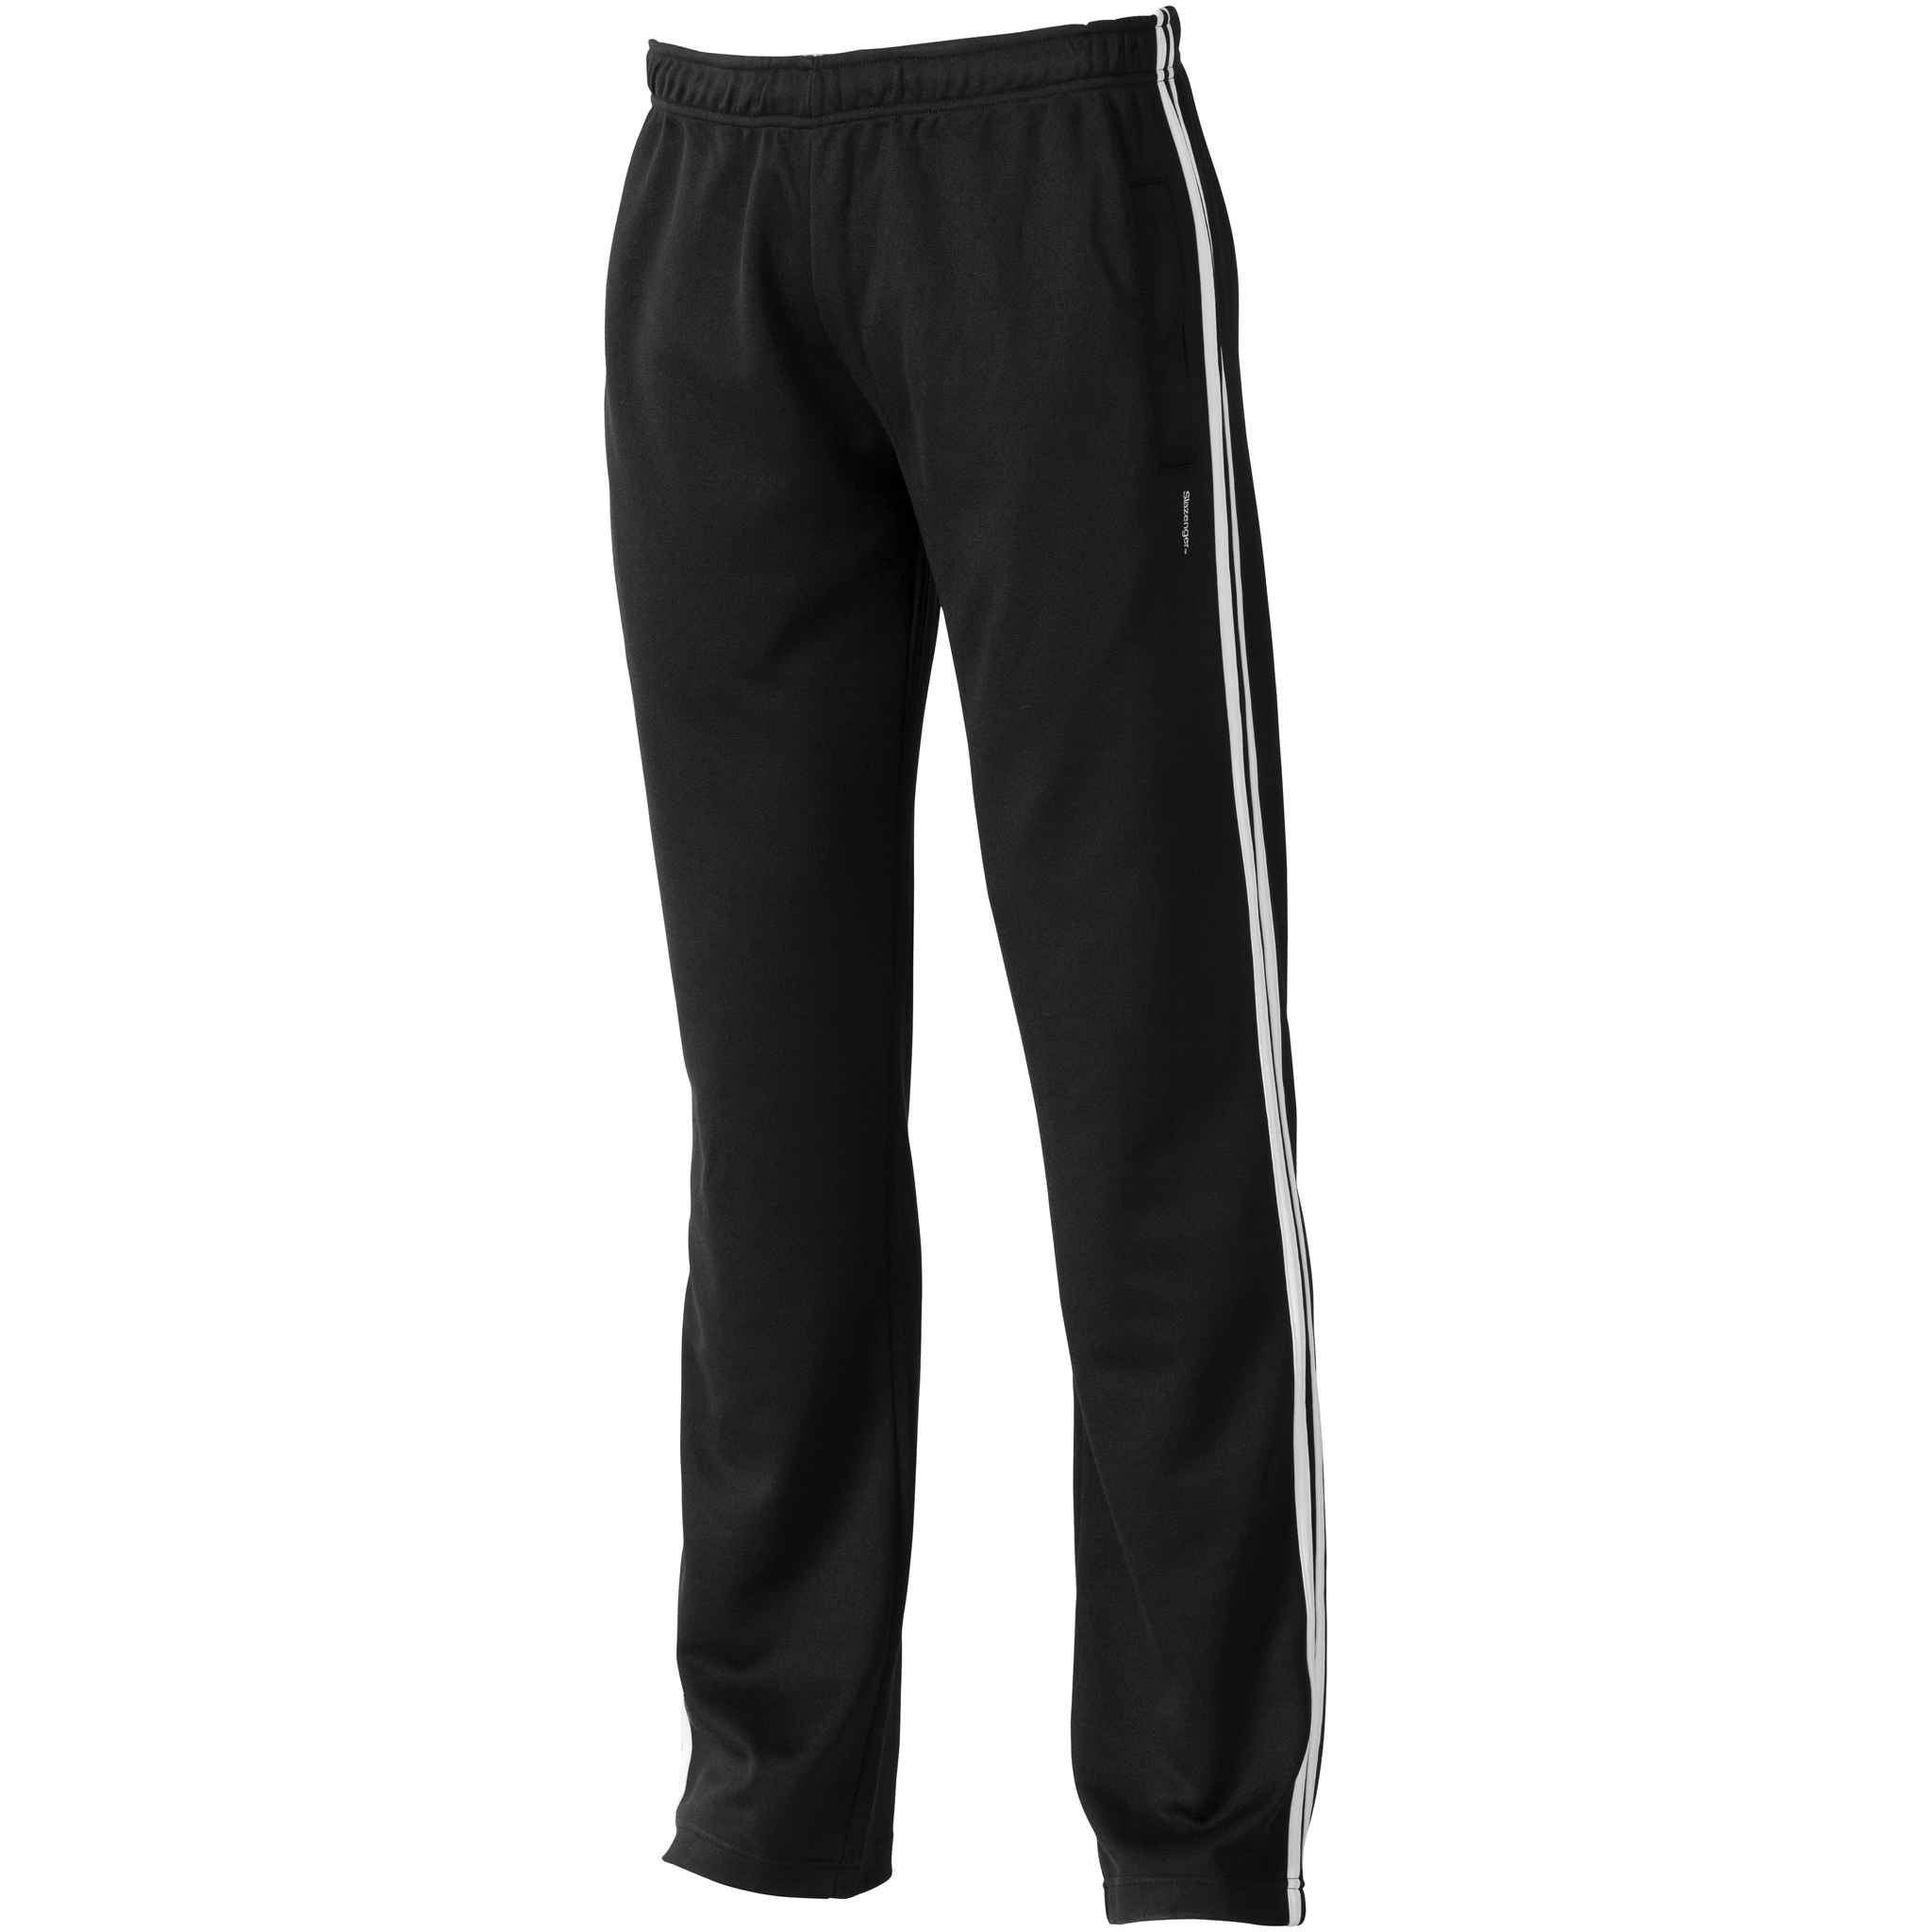 Slazenger-Court-Ladies-Sports-Trousers-PF1799